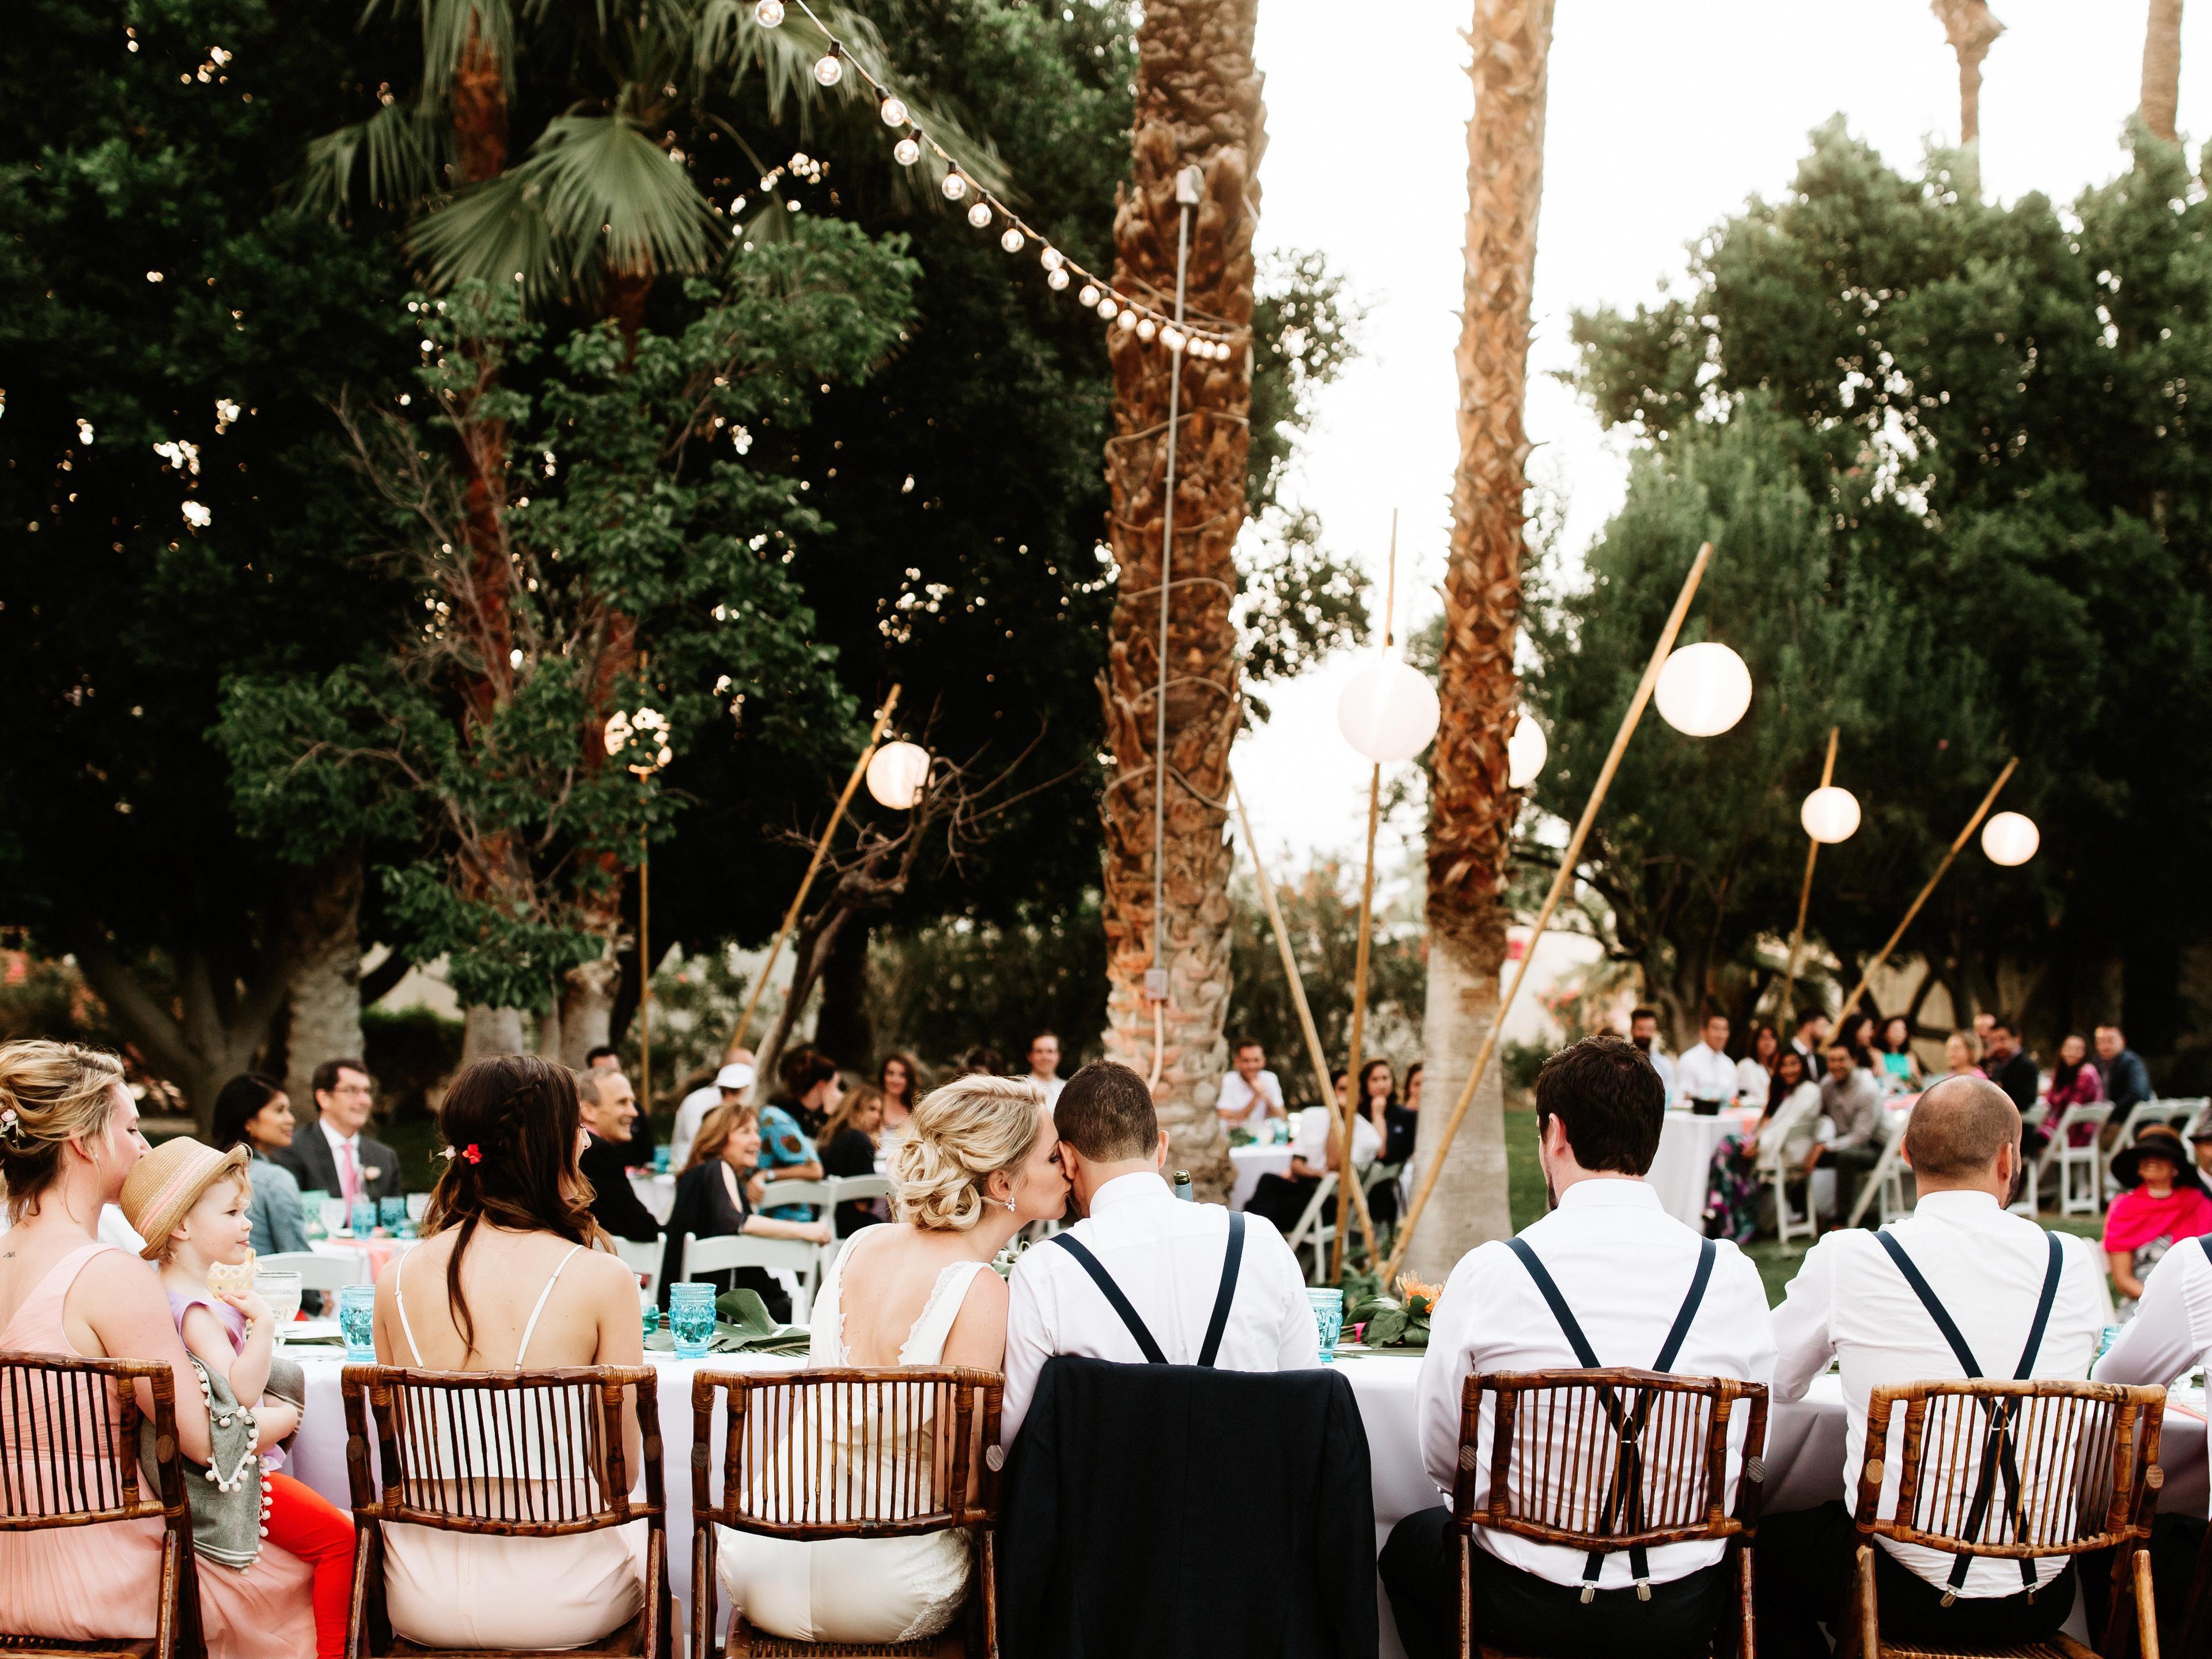 25 Backyard Wedding Ideas